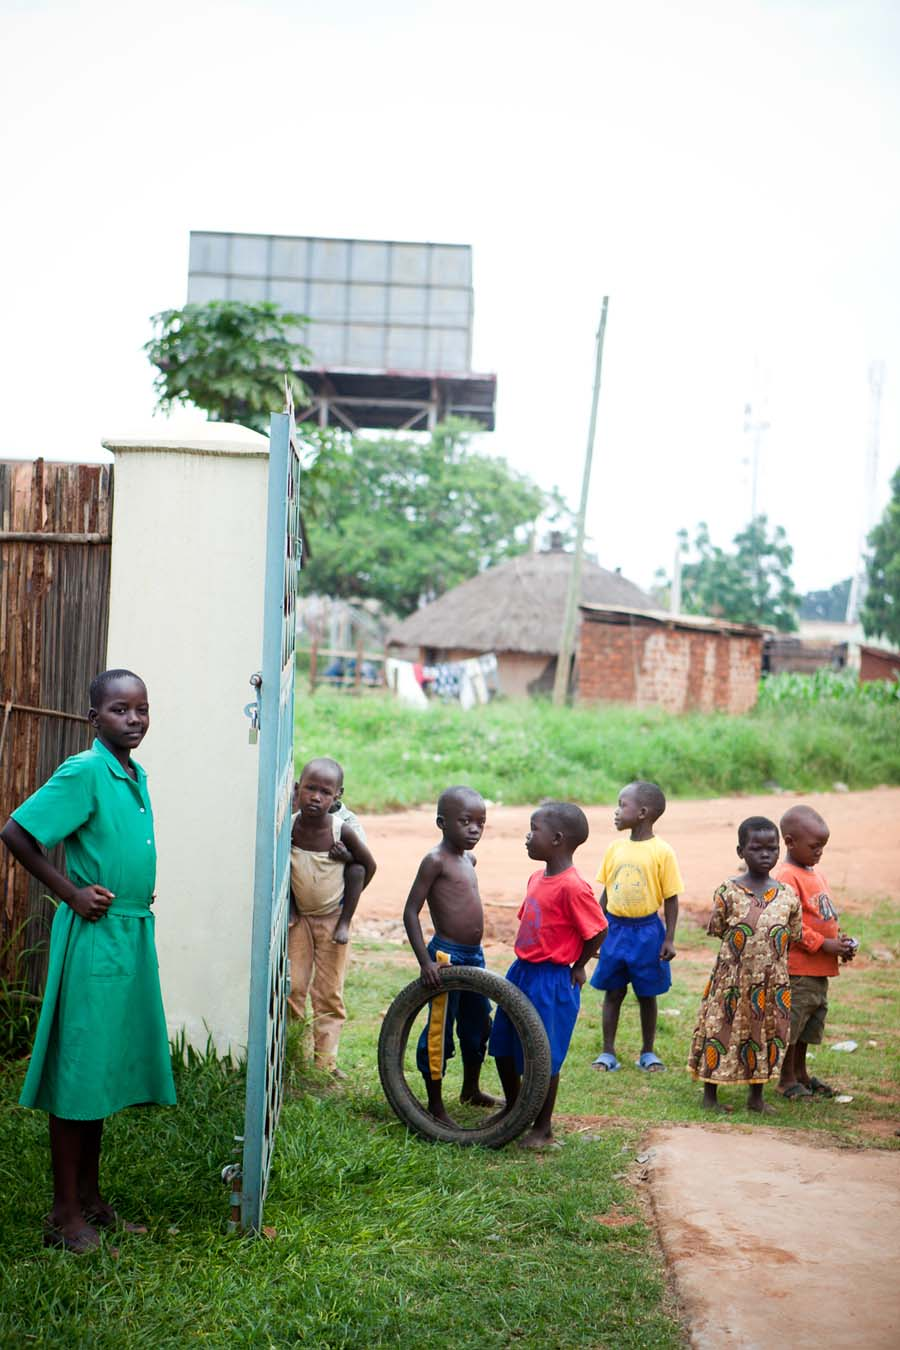 jessicadavisphotography.com | Jessica Davis Photography | Portrait Work in Uganda| Travel Photographer | World Event Photographs 0 (1).jpg